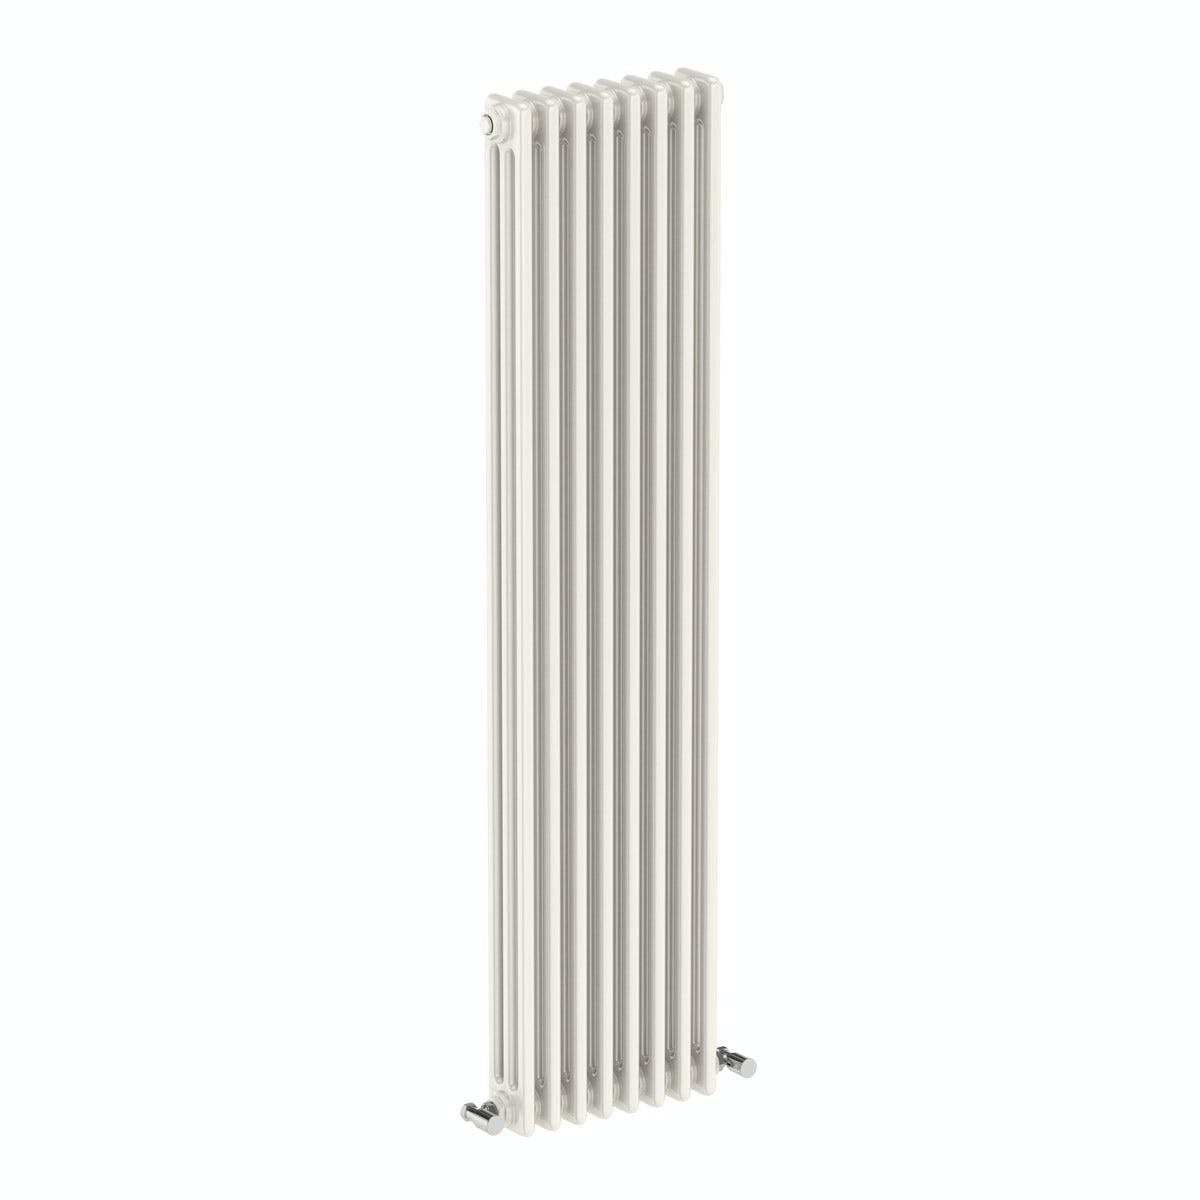 Dulwich vertical white triple column radiator 1500 x 378